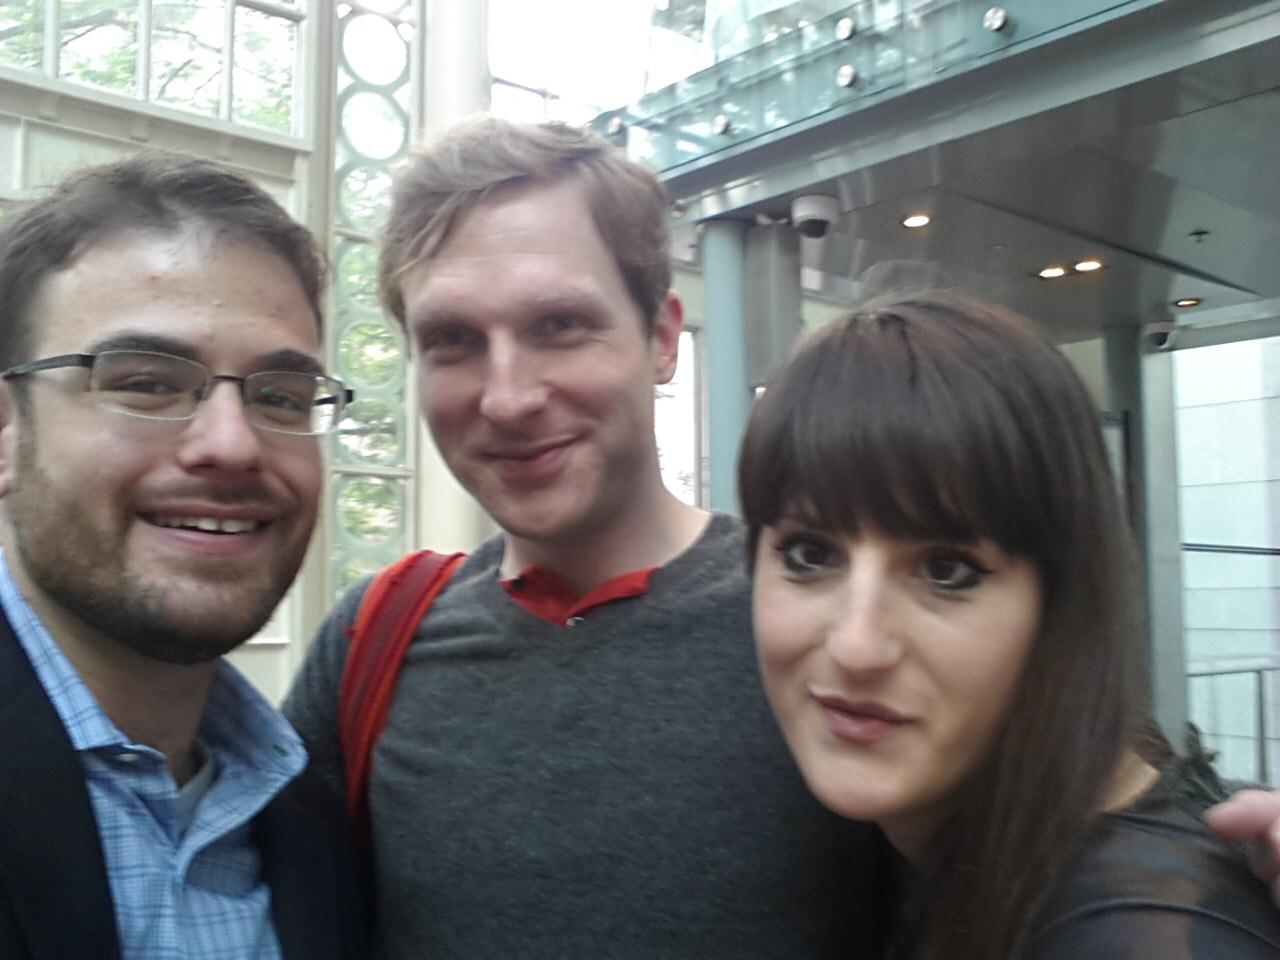 Three very happy opera makers! From L-to-R, Evan Kassof, Aleksandar Hut Kono, and Ruth Mariner.